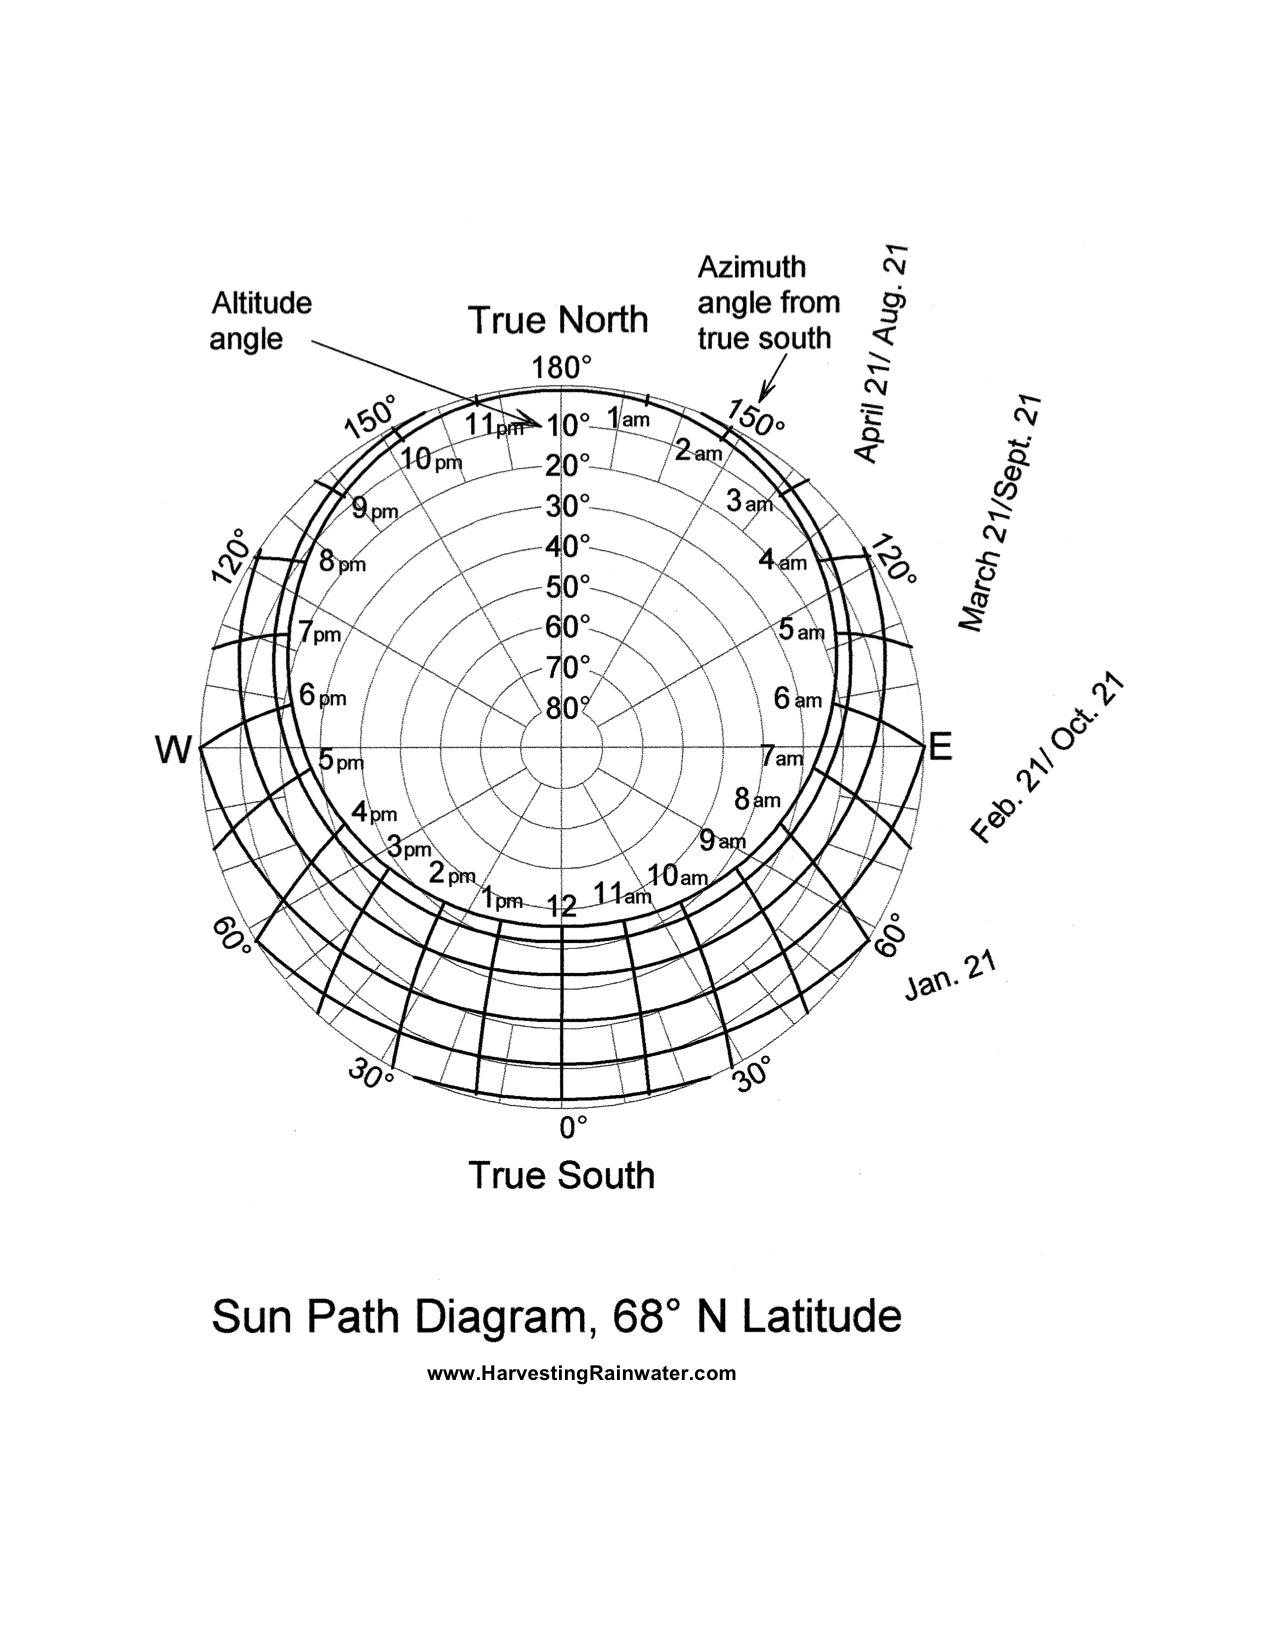 Sun Path Diagram 68o N Latitude